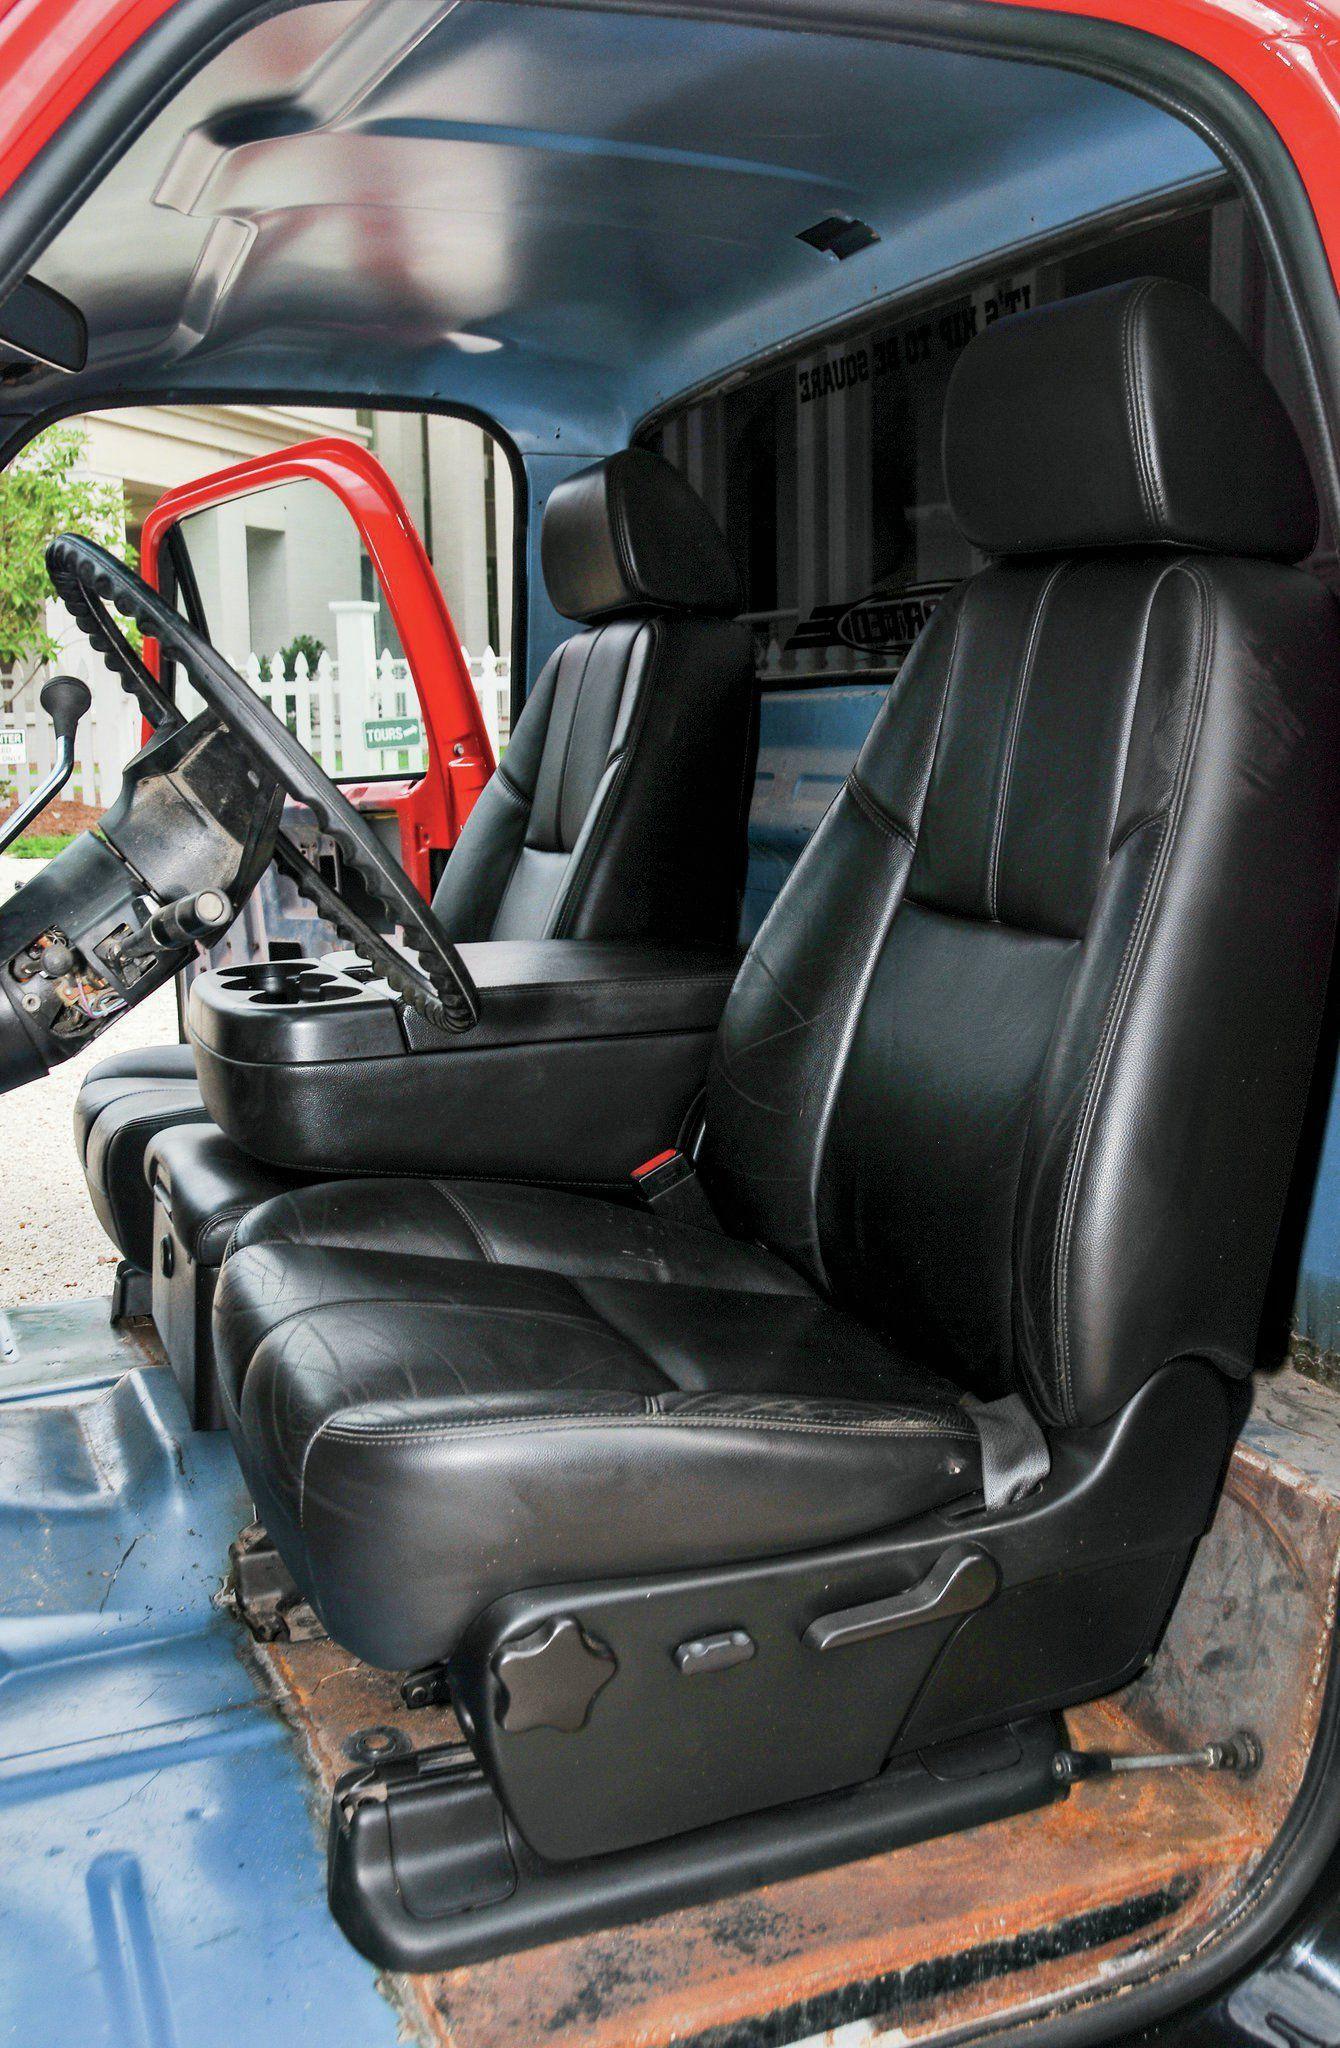 Chevy Silverado Interior Accessories Finest Silverado Chevrolet Silverado Accessories Chevy